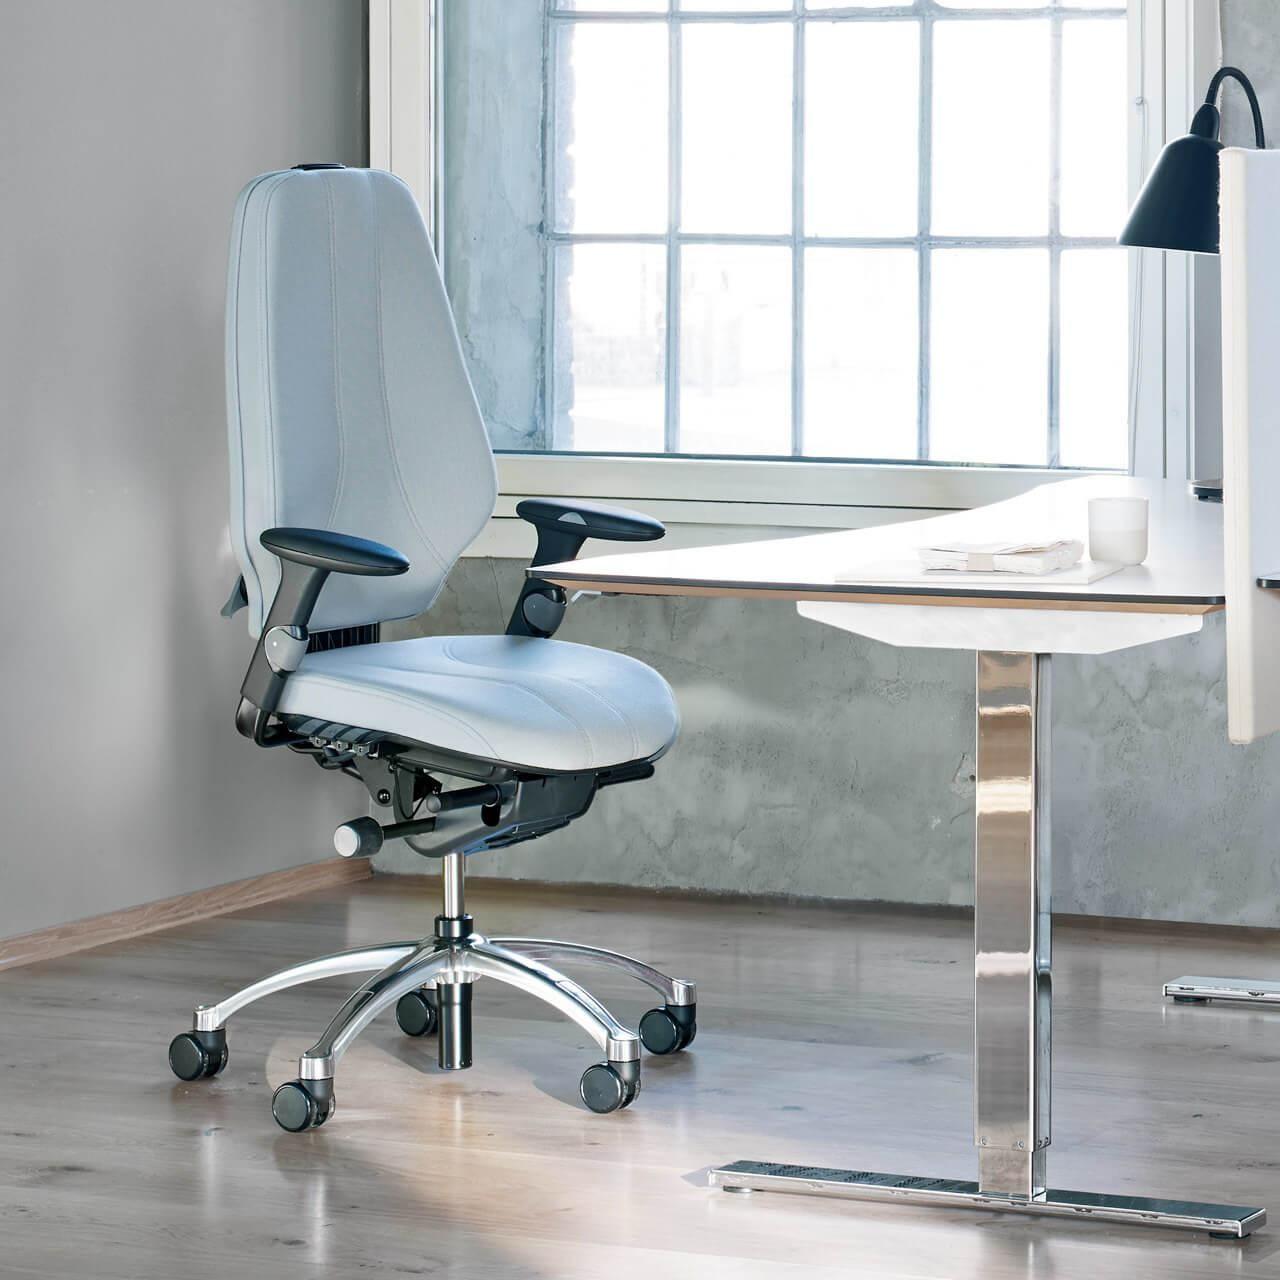 Rh logic 400 xl bureaustoel STKARHX400 0006 Omgeving